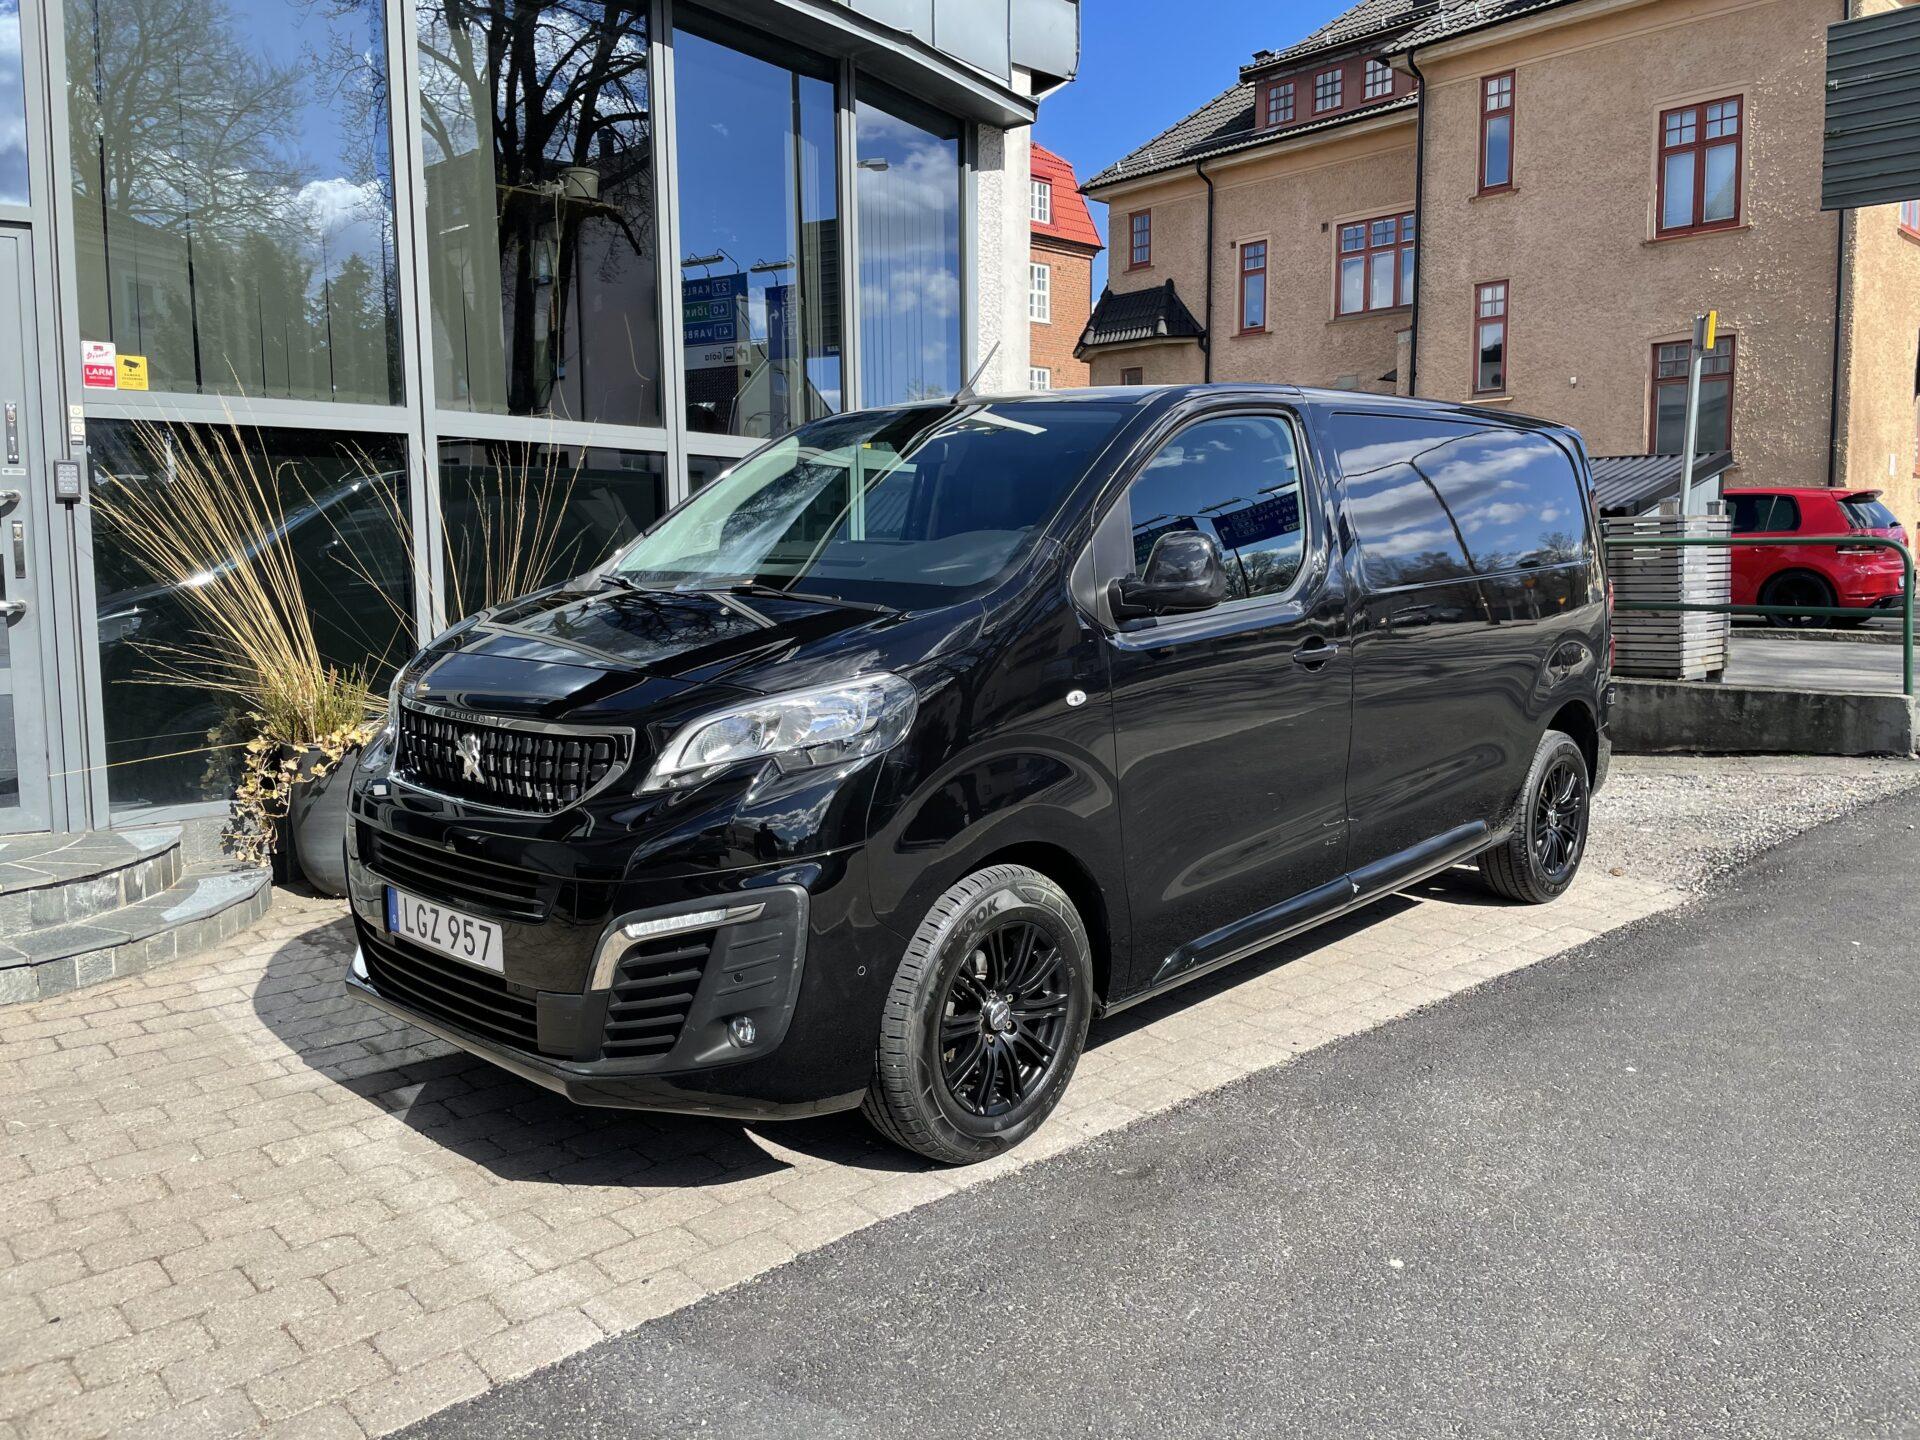 Peugeot expert 2.0 BlueHDi L2 Pro+ Aut 177hk / Drag